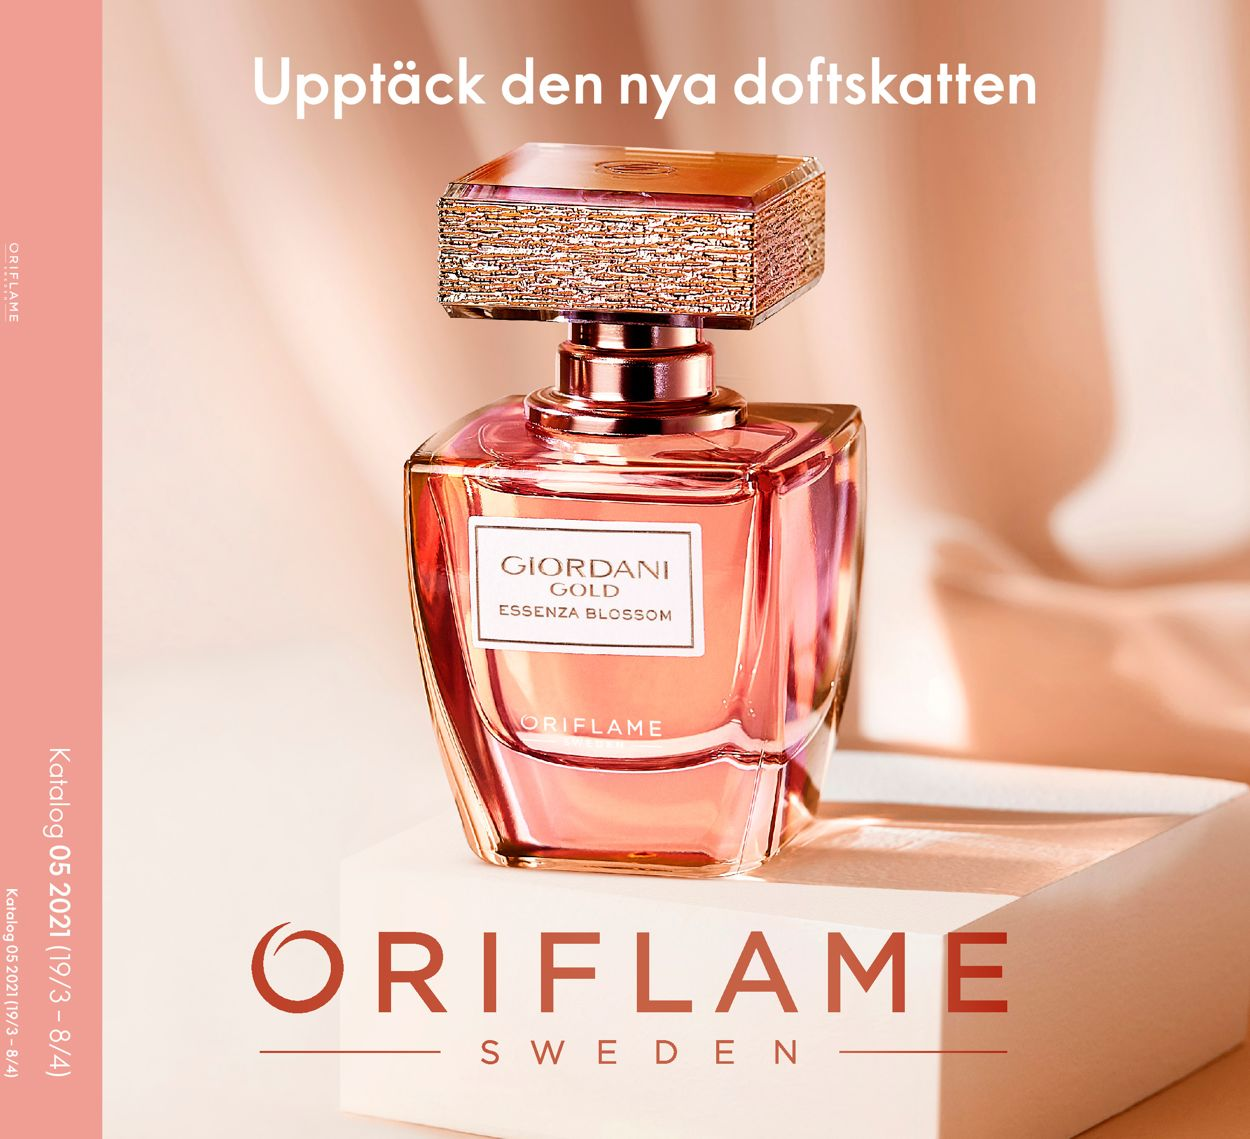 Reklamblad Oriflame från 19/03-2021